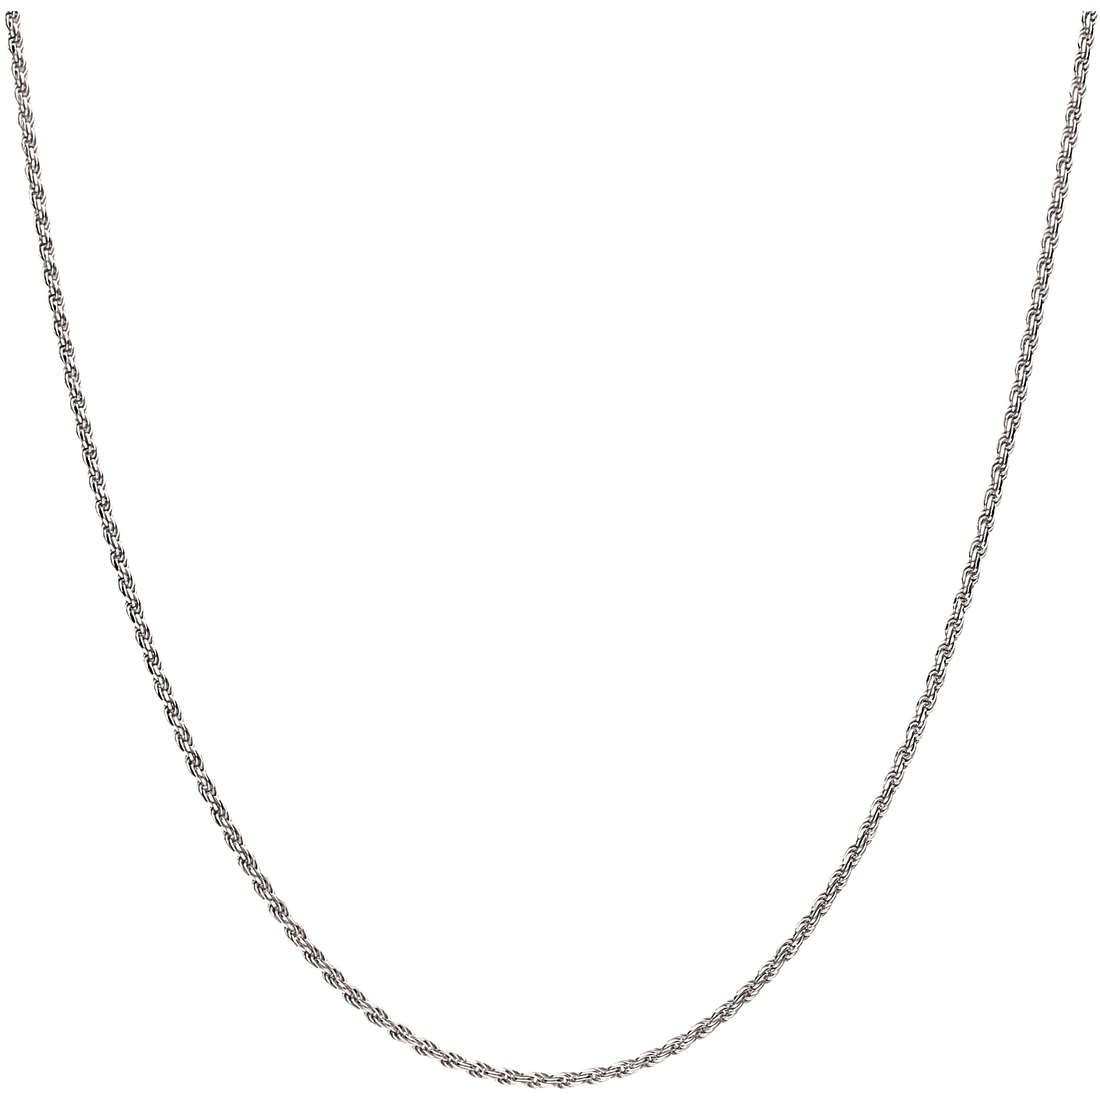 collana donna gioielli GioiaPura GPSRBS0373F-R-40